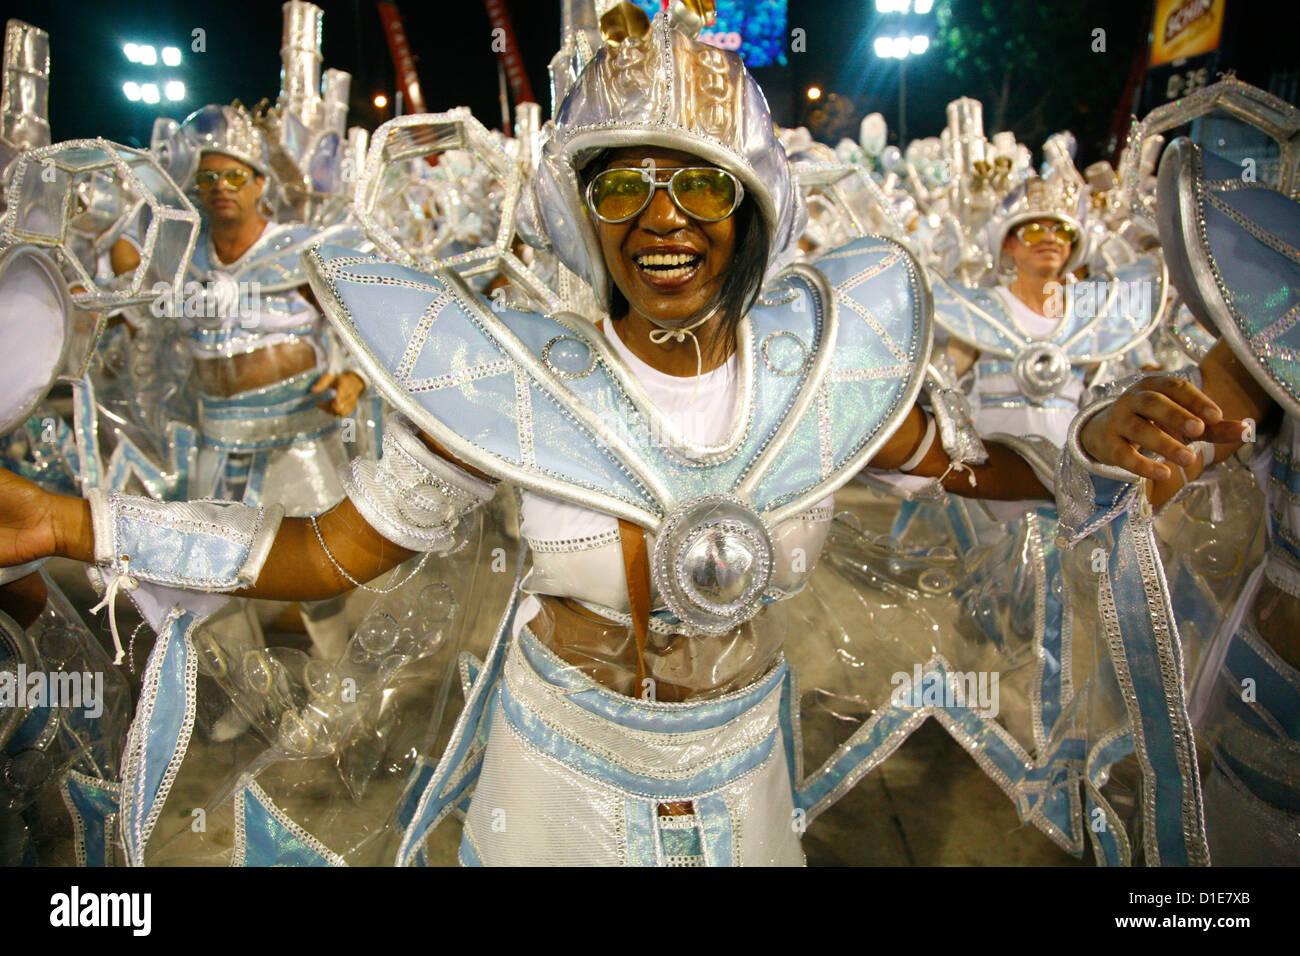 Karnevalsumzug in die Sambodrome, Rio De Janeiro, Brasilien, Südamerika Stockfoto